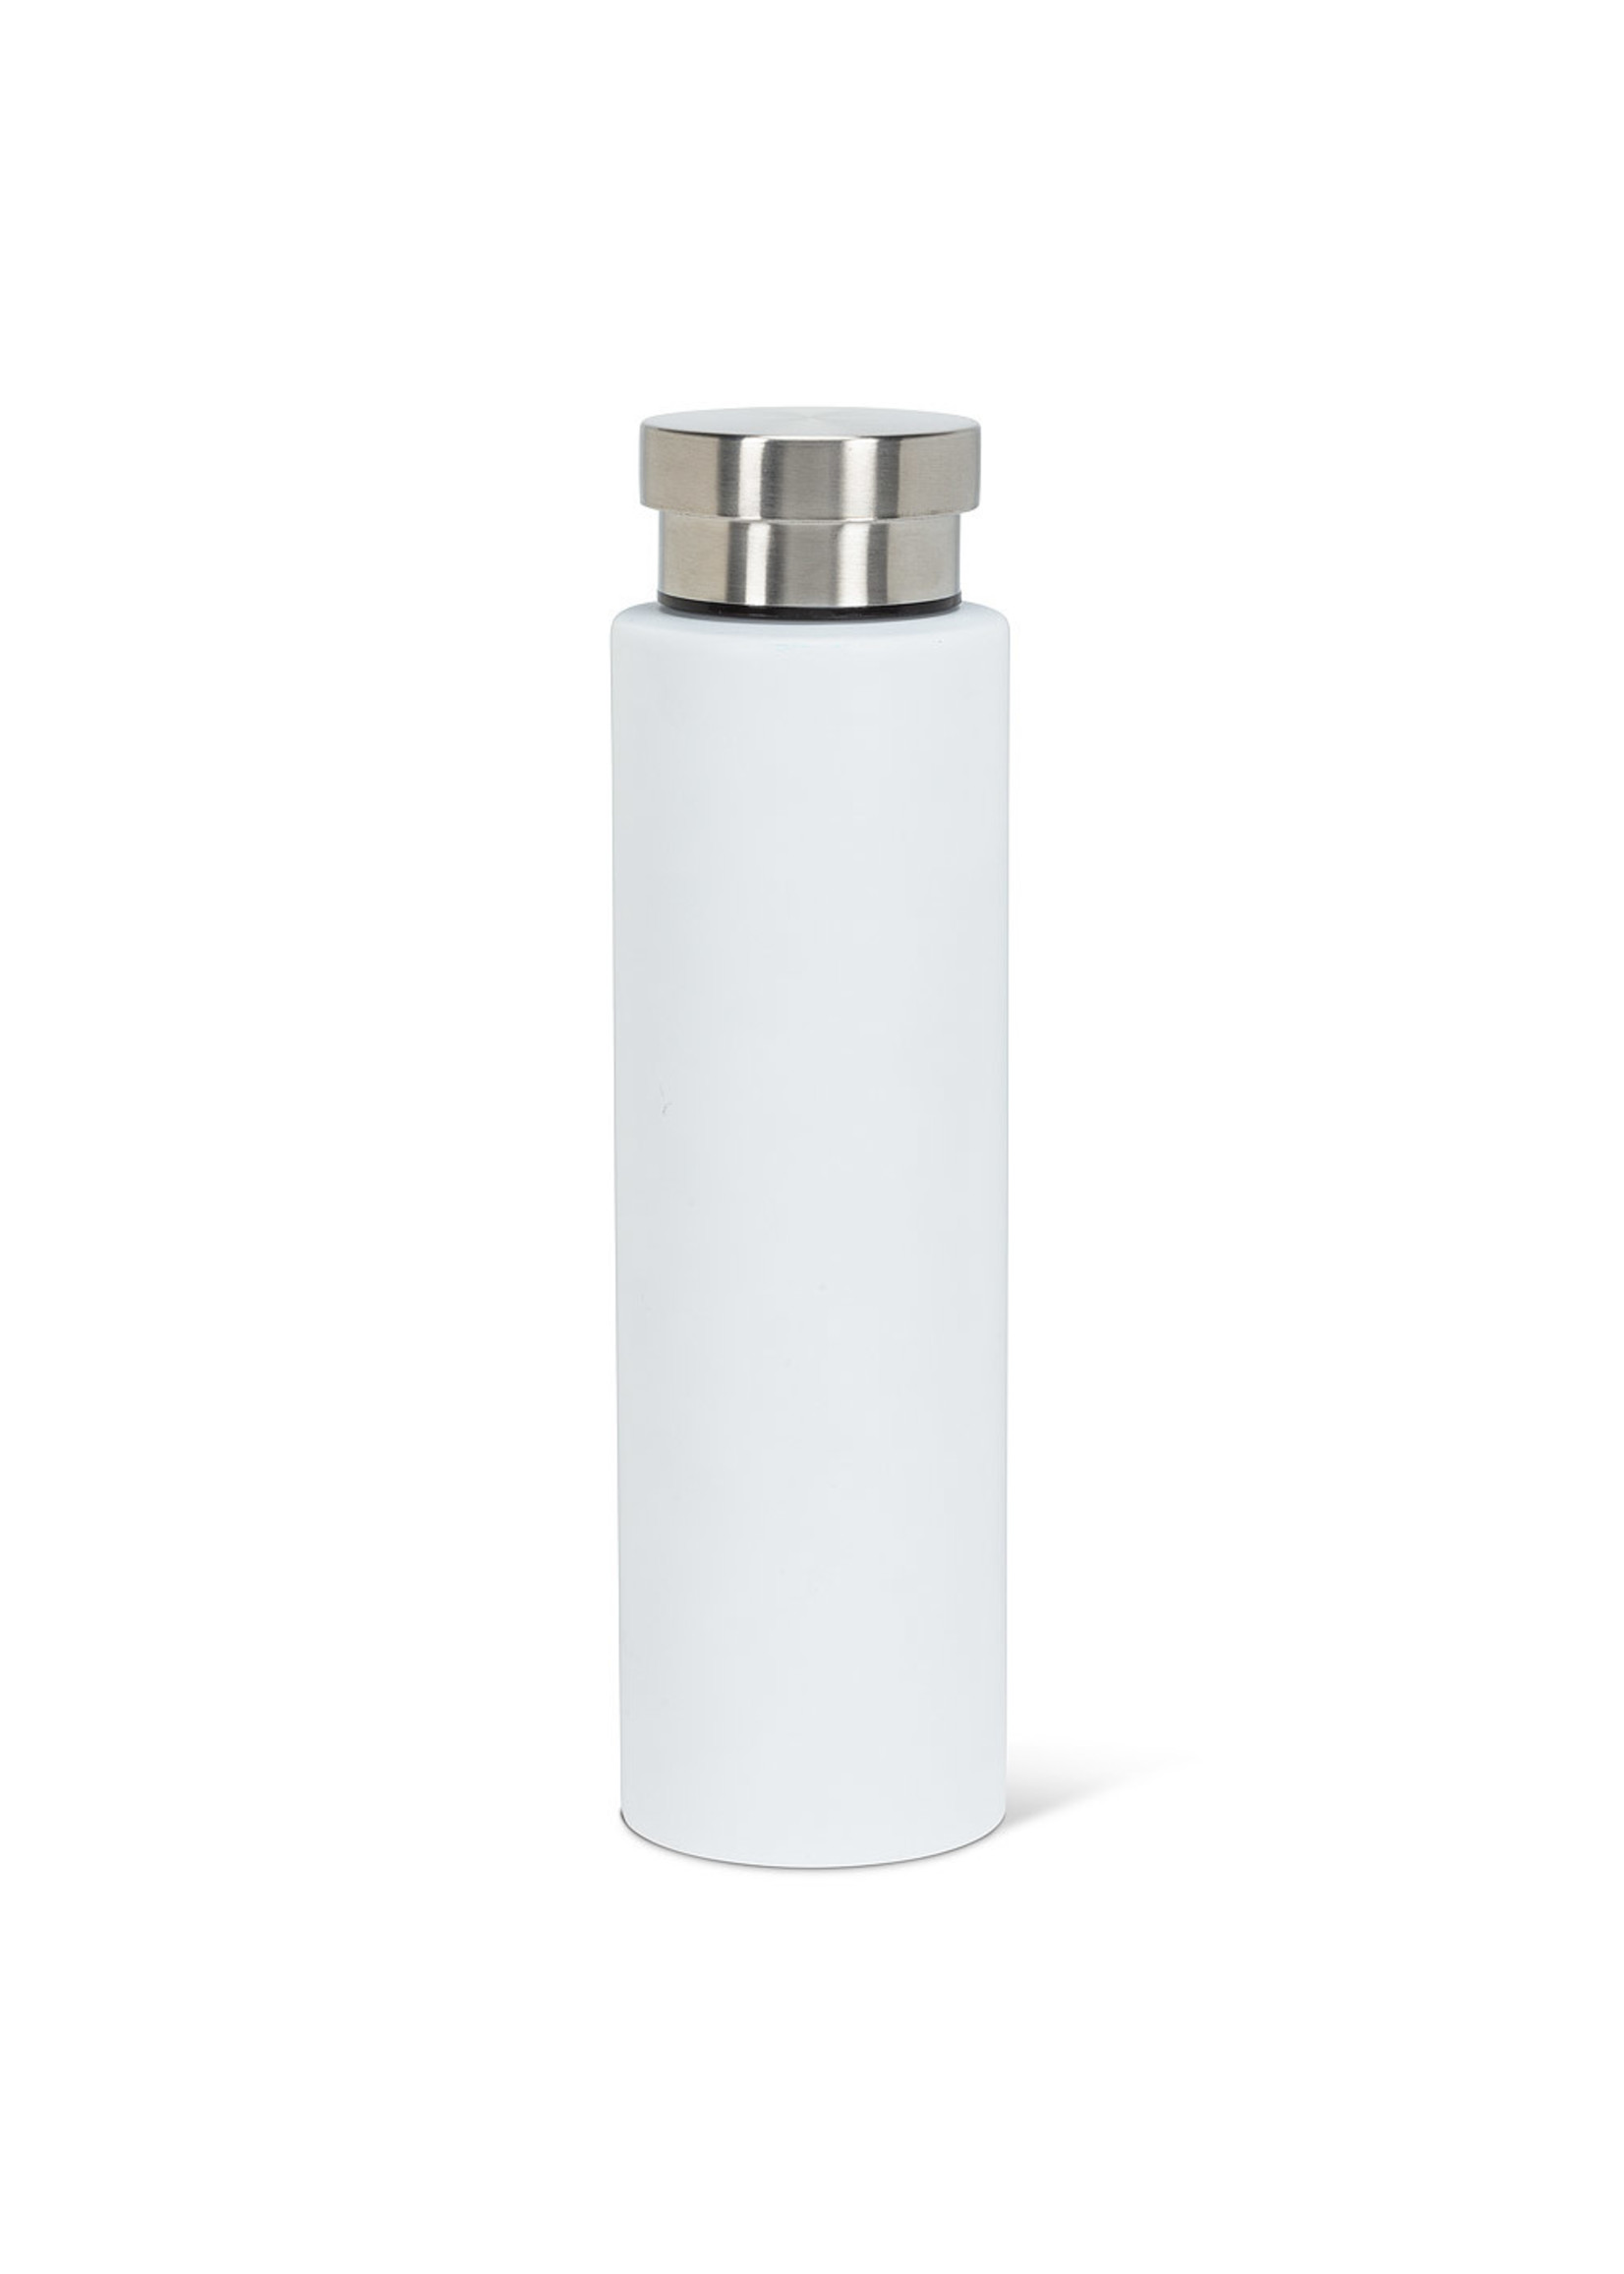 Bevi Insulated White Bottle - 28oz